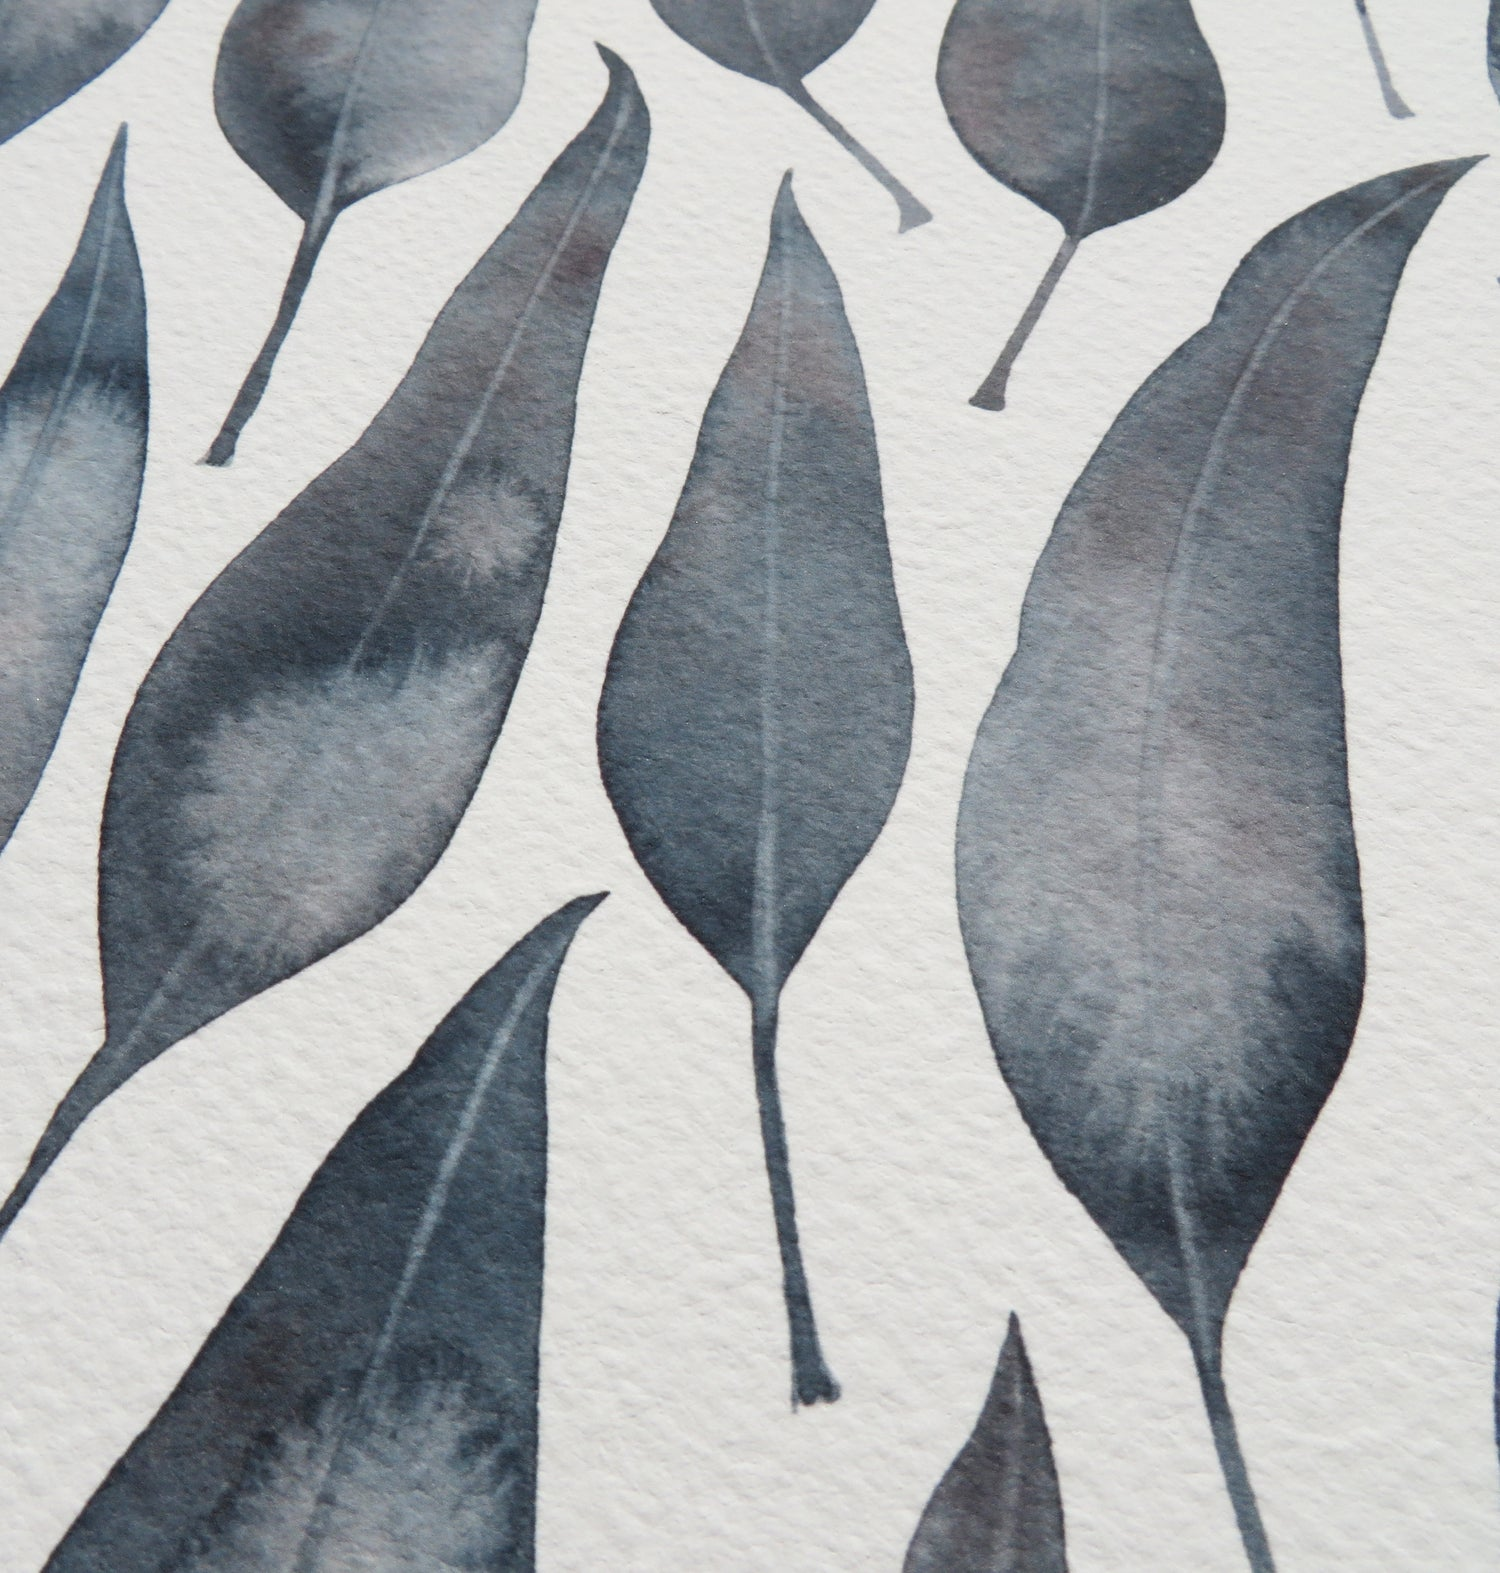 Image of Silver Princess Eucalyptus Leaves fine art print